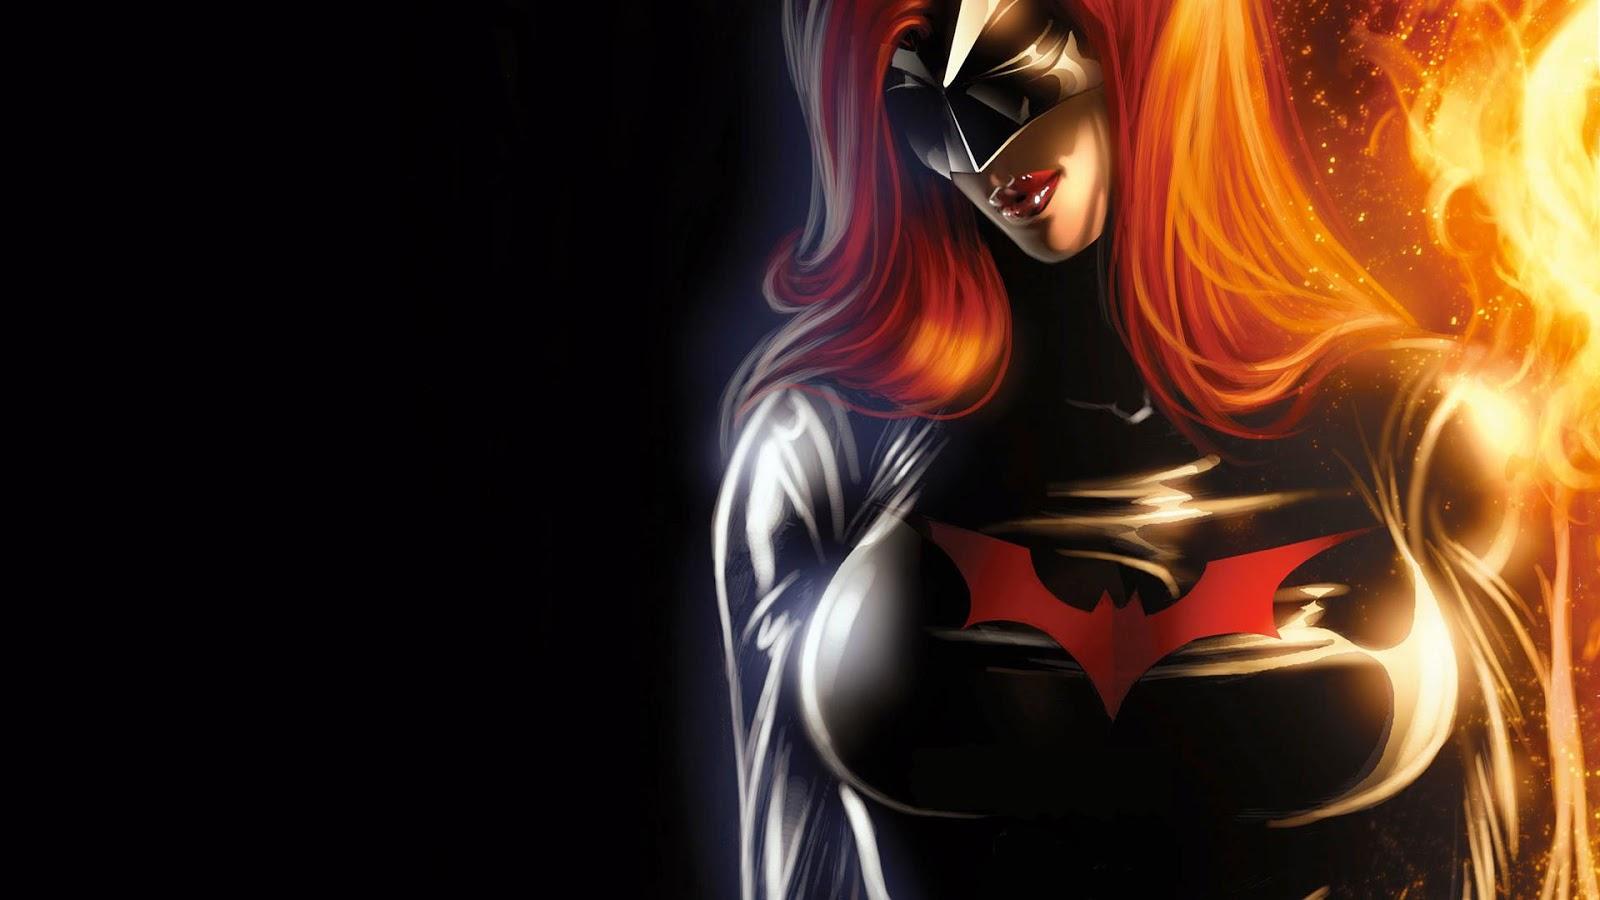 Hd wallpaper superhero - Superhero Wallpapers Hd Screenshot